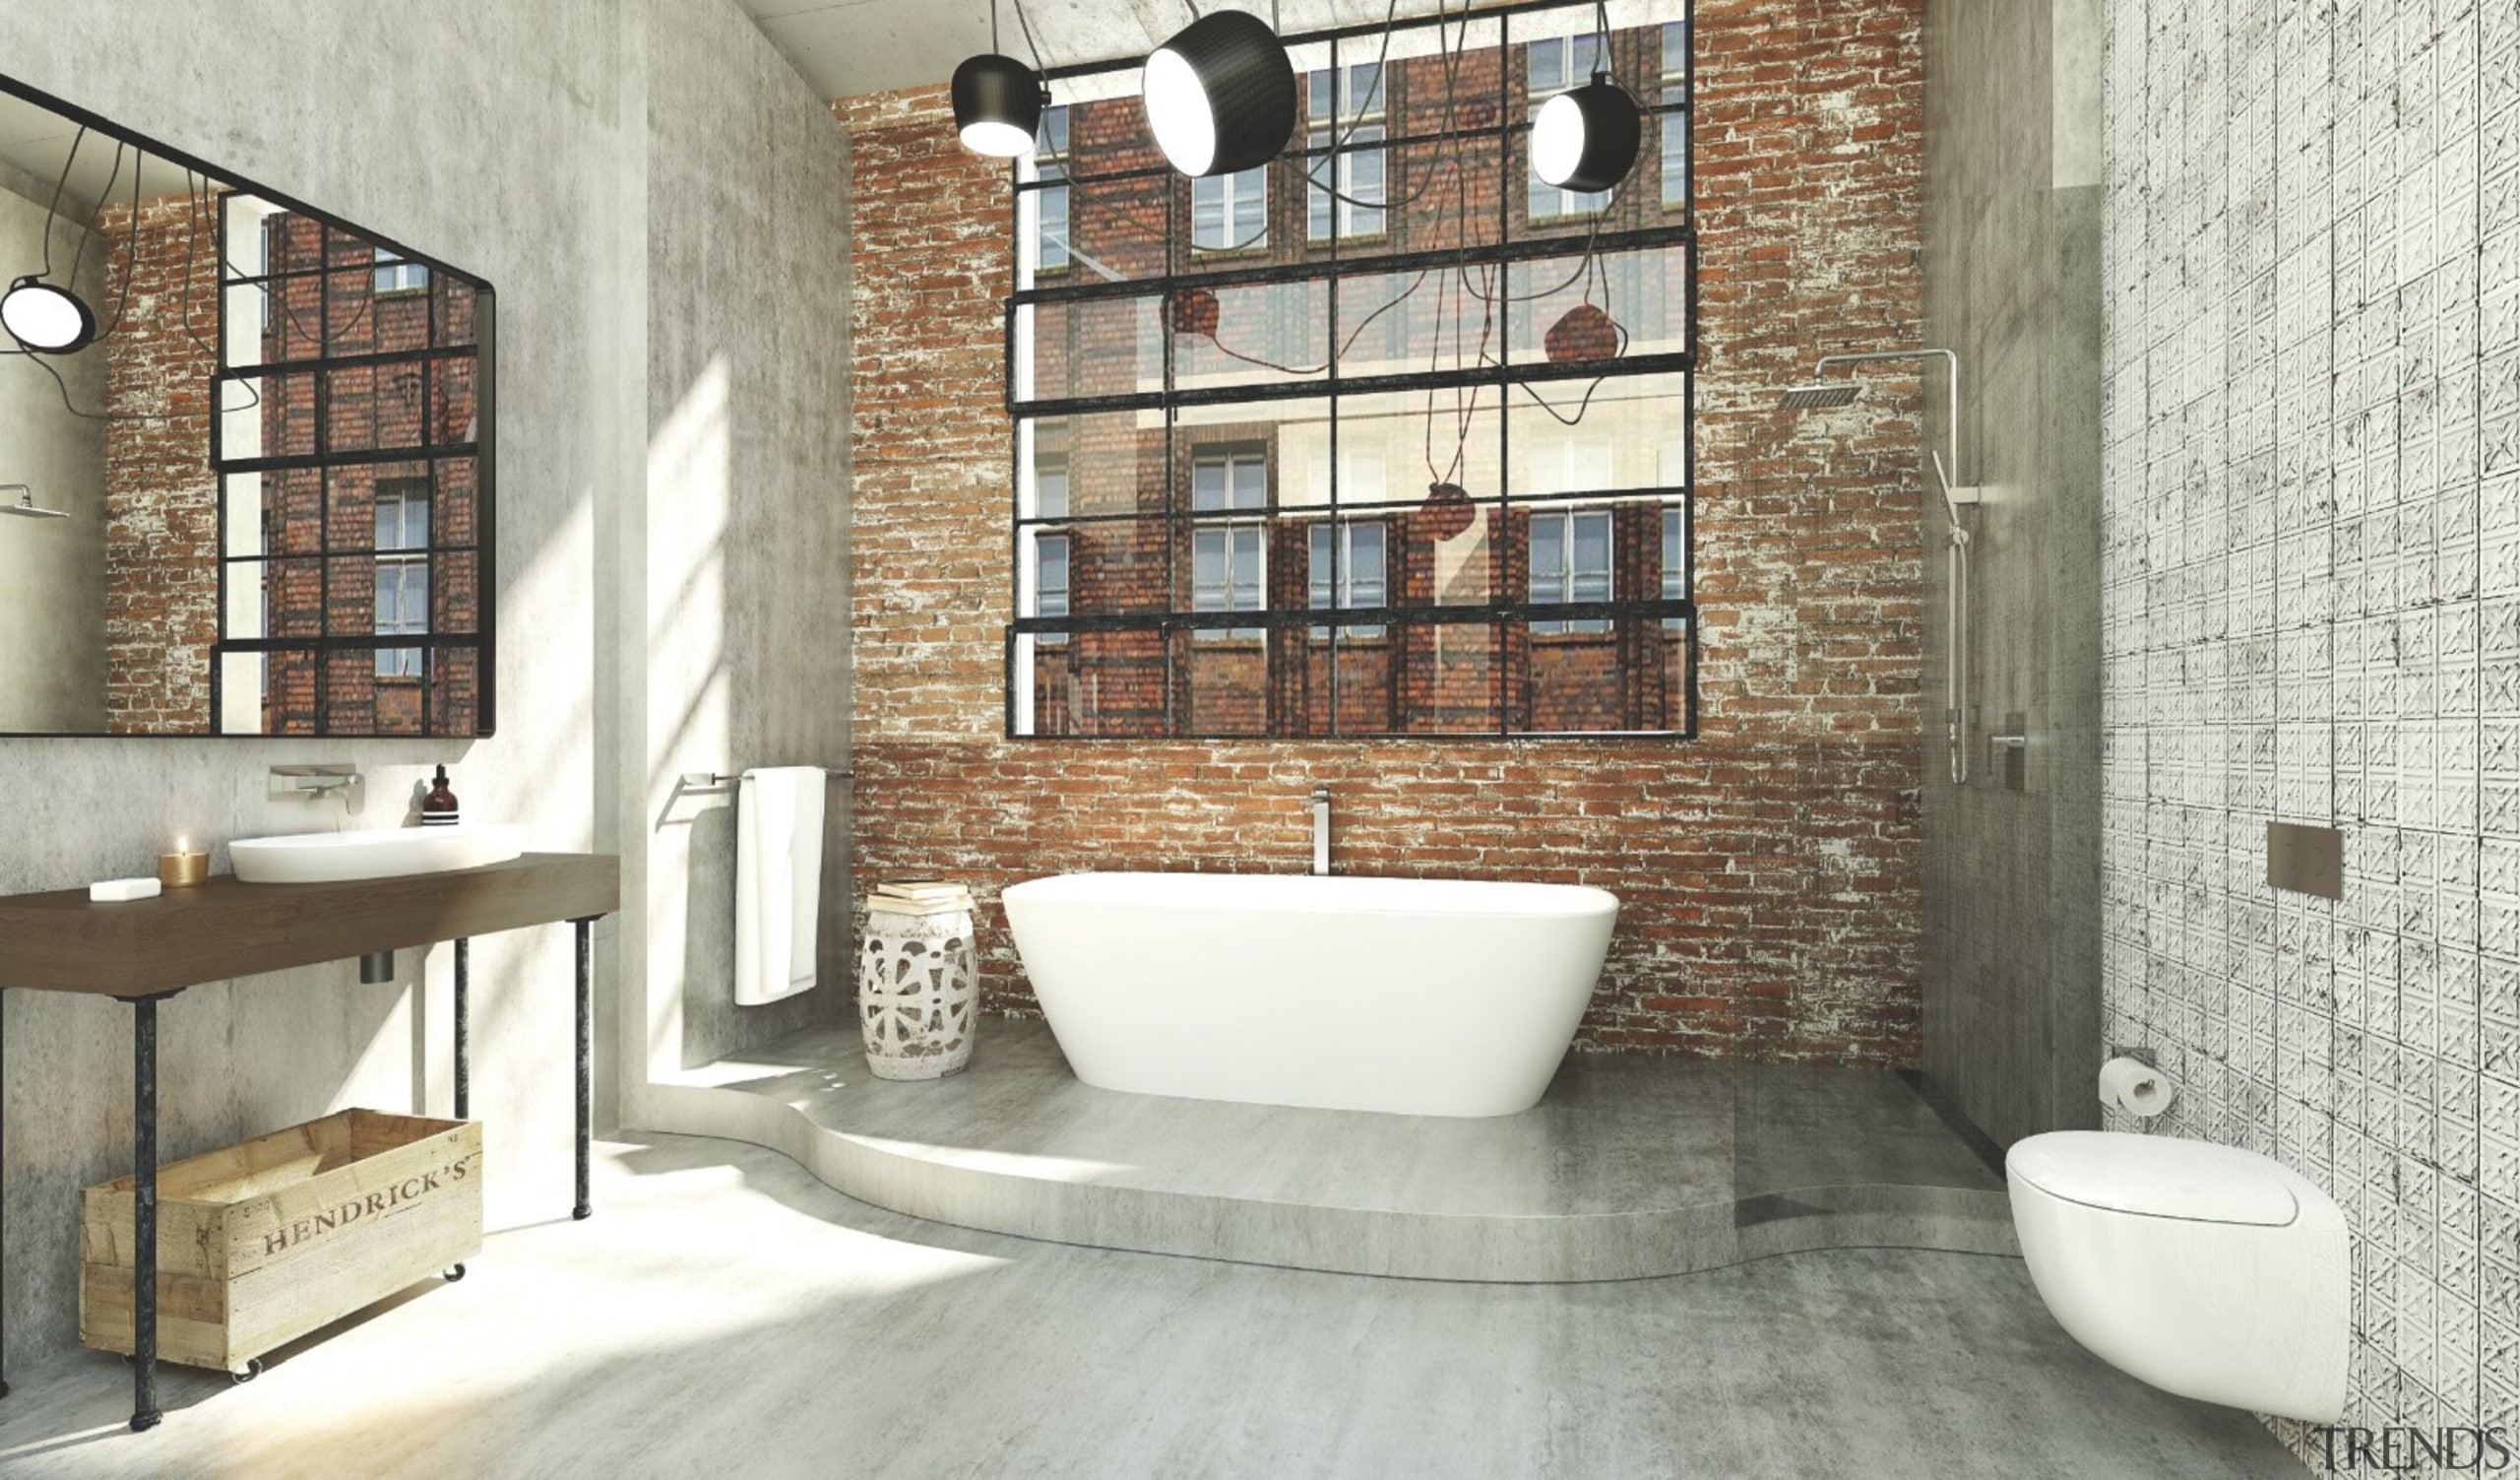 Iconic bathroomware brand Caroma has announced the bathroom, floor, flooring, home, interior design, loft, room, tile, wall, white, gray